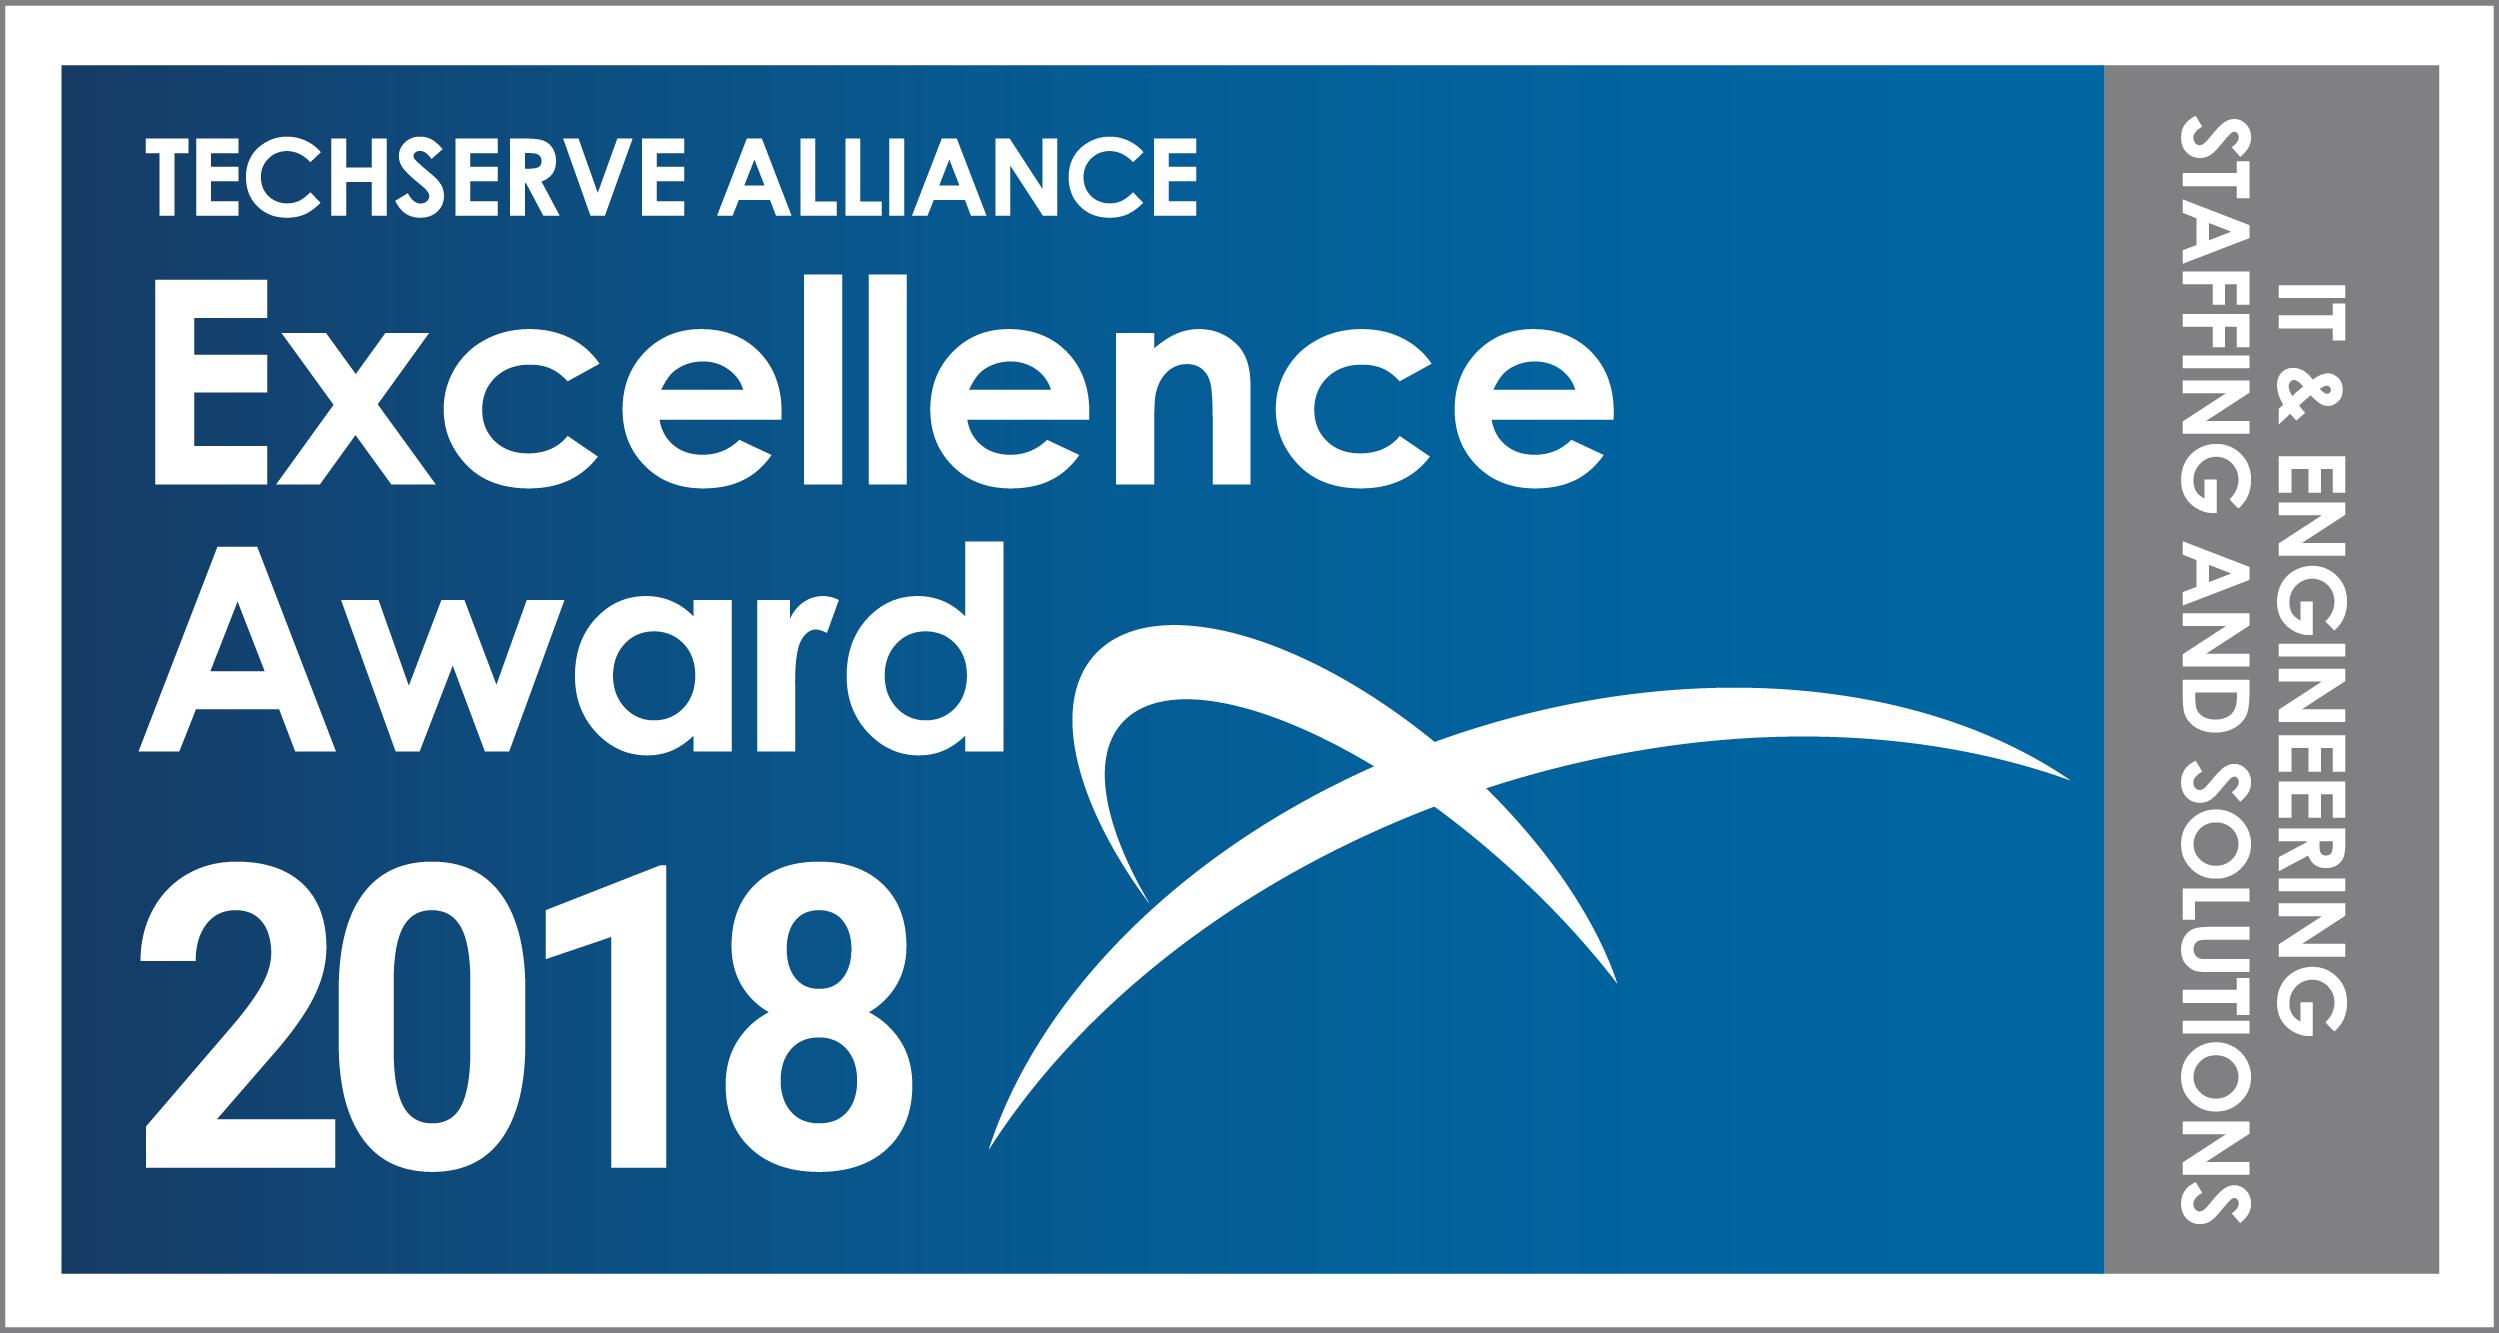 TechServe Alliance Excellence Award 2018